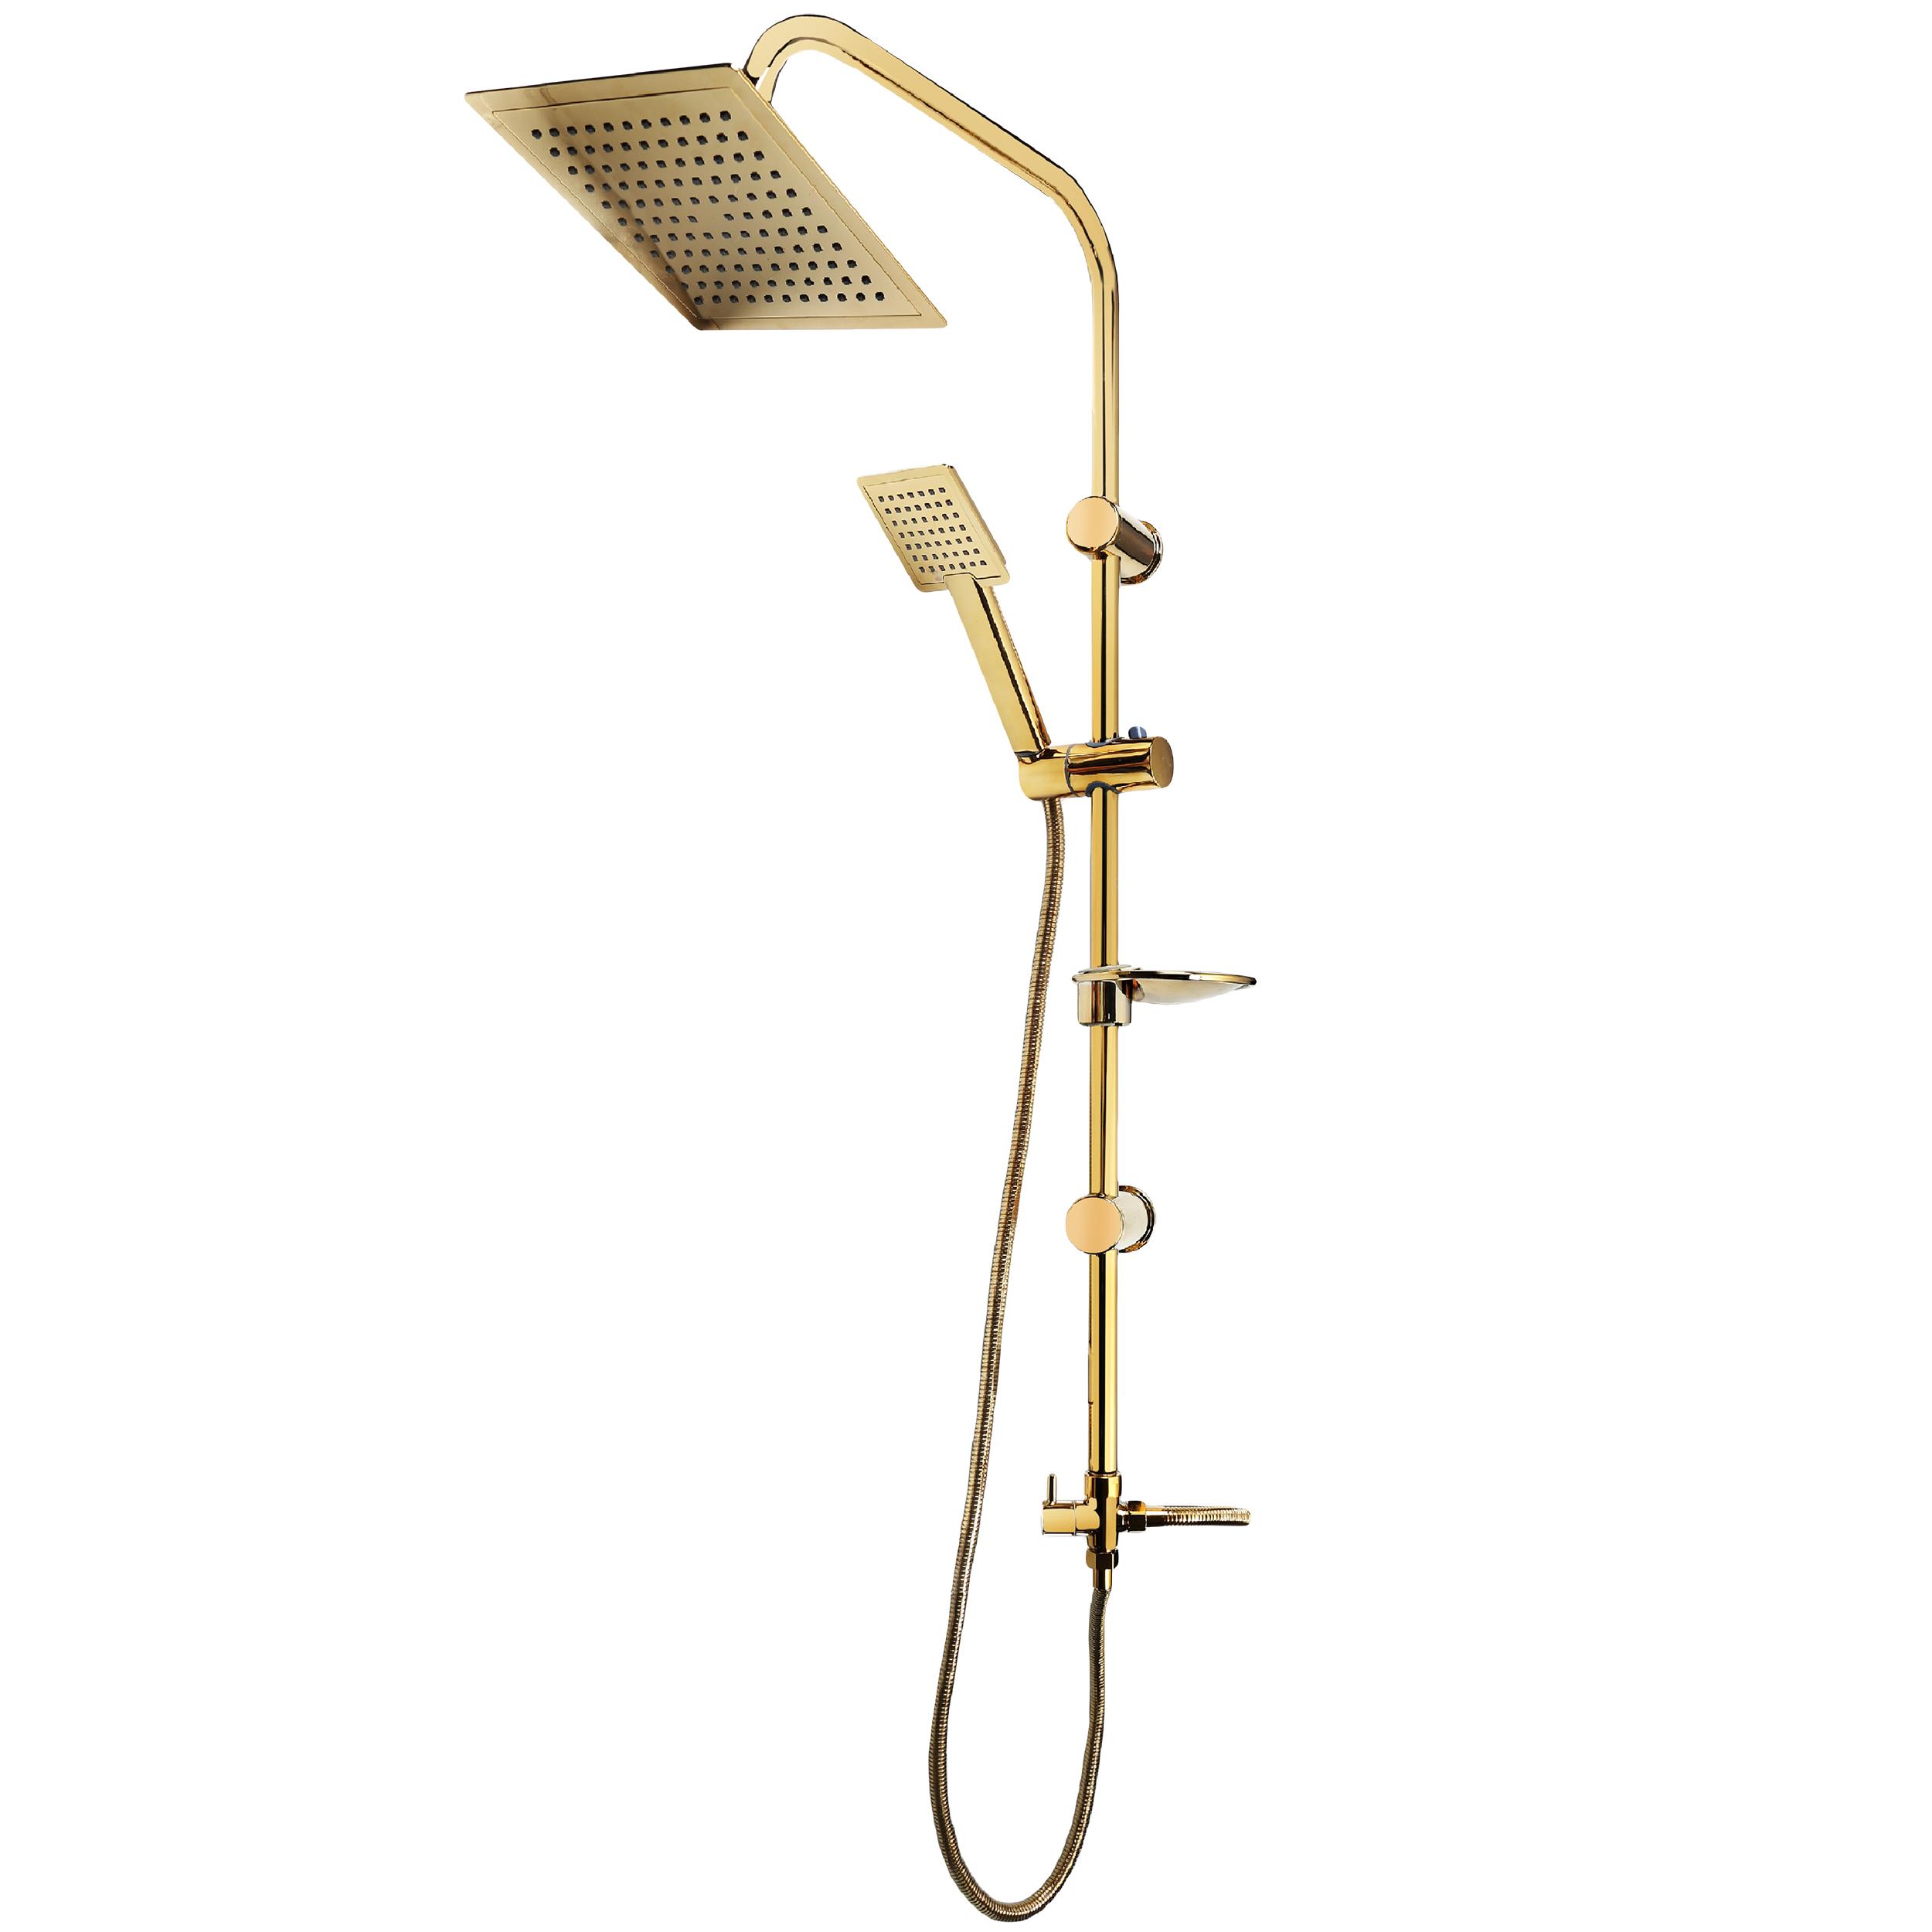 قیمت                                      دوش حمام گلپانیک مدل یونیورست T-2021